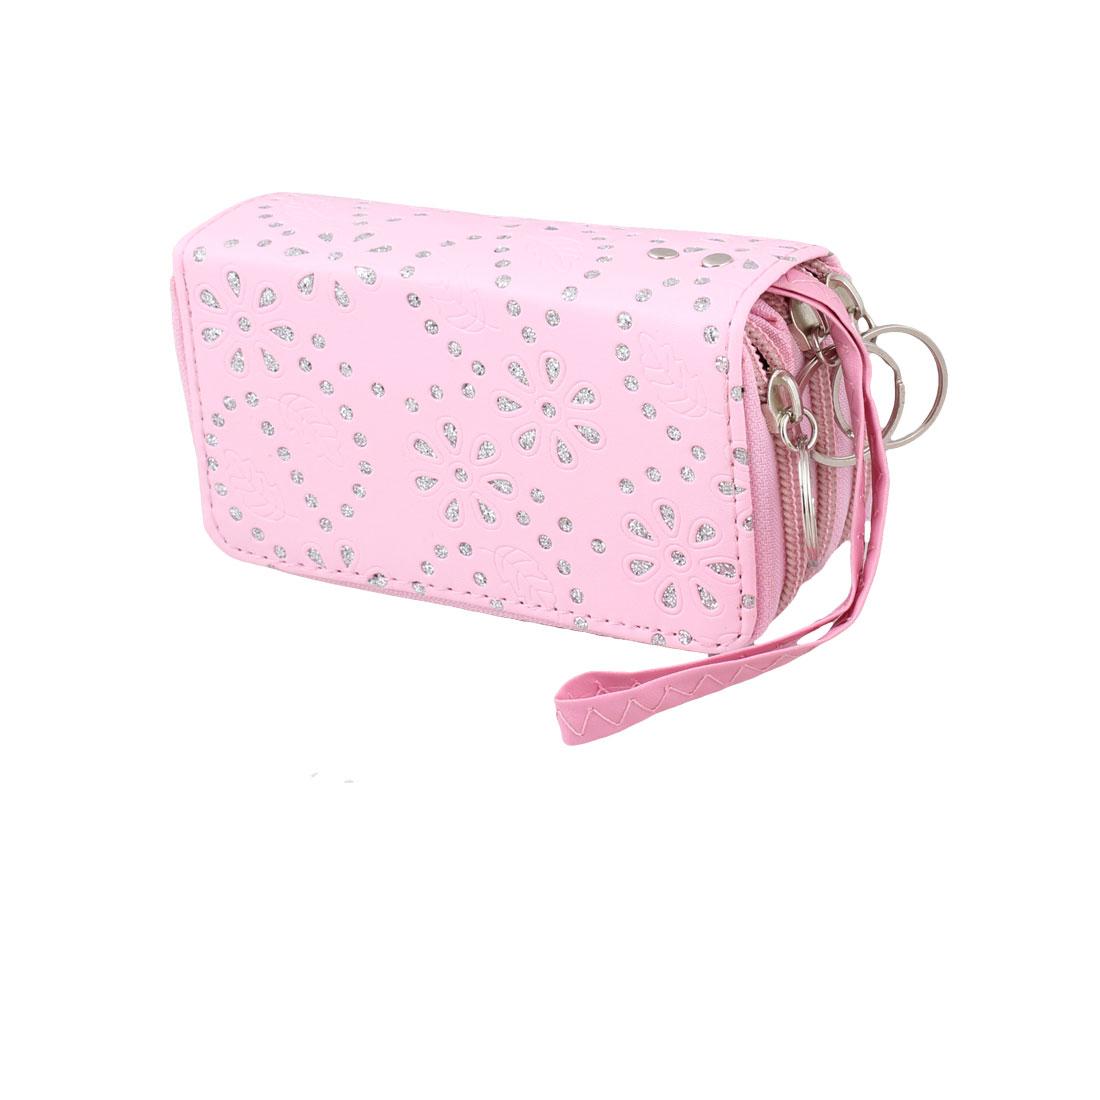 Women Metal Keys Holder Pink Floral Leaf 4 Slots Zipper Wallet Purse Handbag Pouch